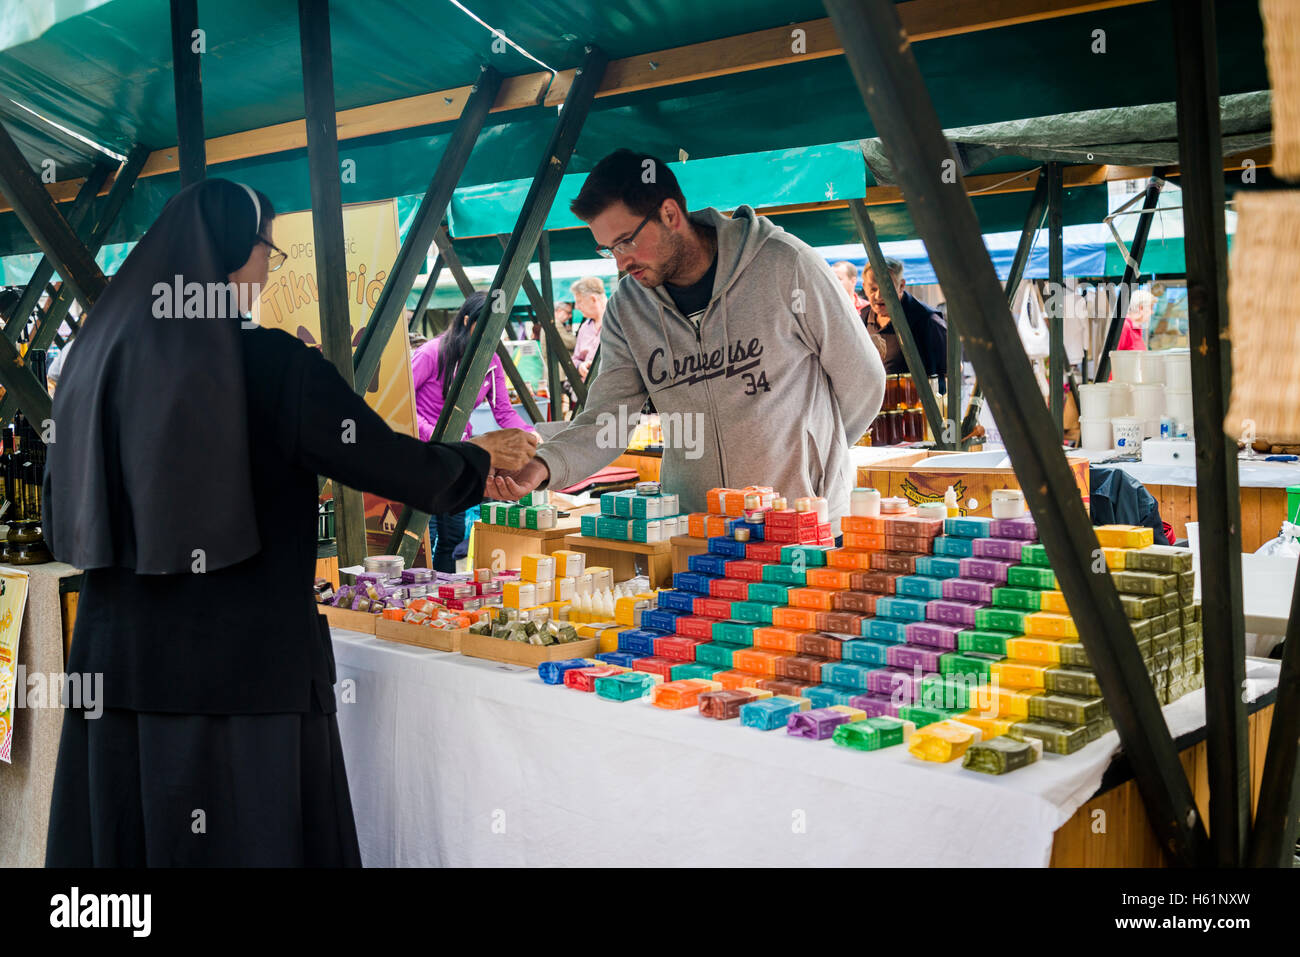 Nun buying handmade soap, Producers' artisan market, Ban Jelacic Square, Zagreb, Croatia - Stock Image